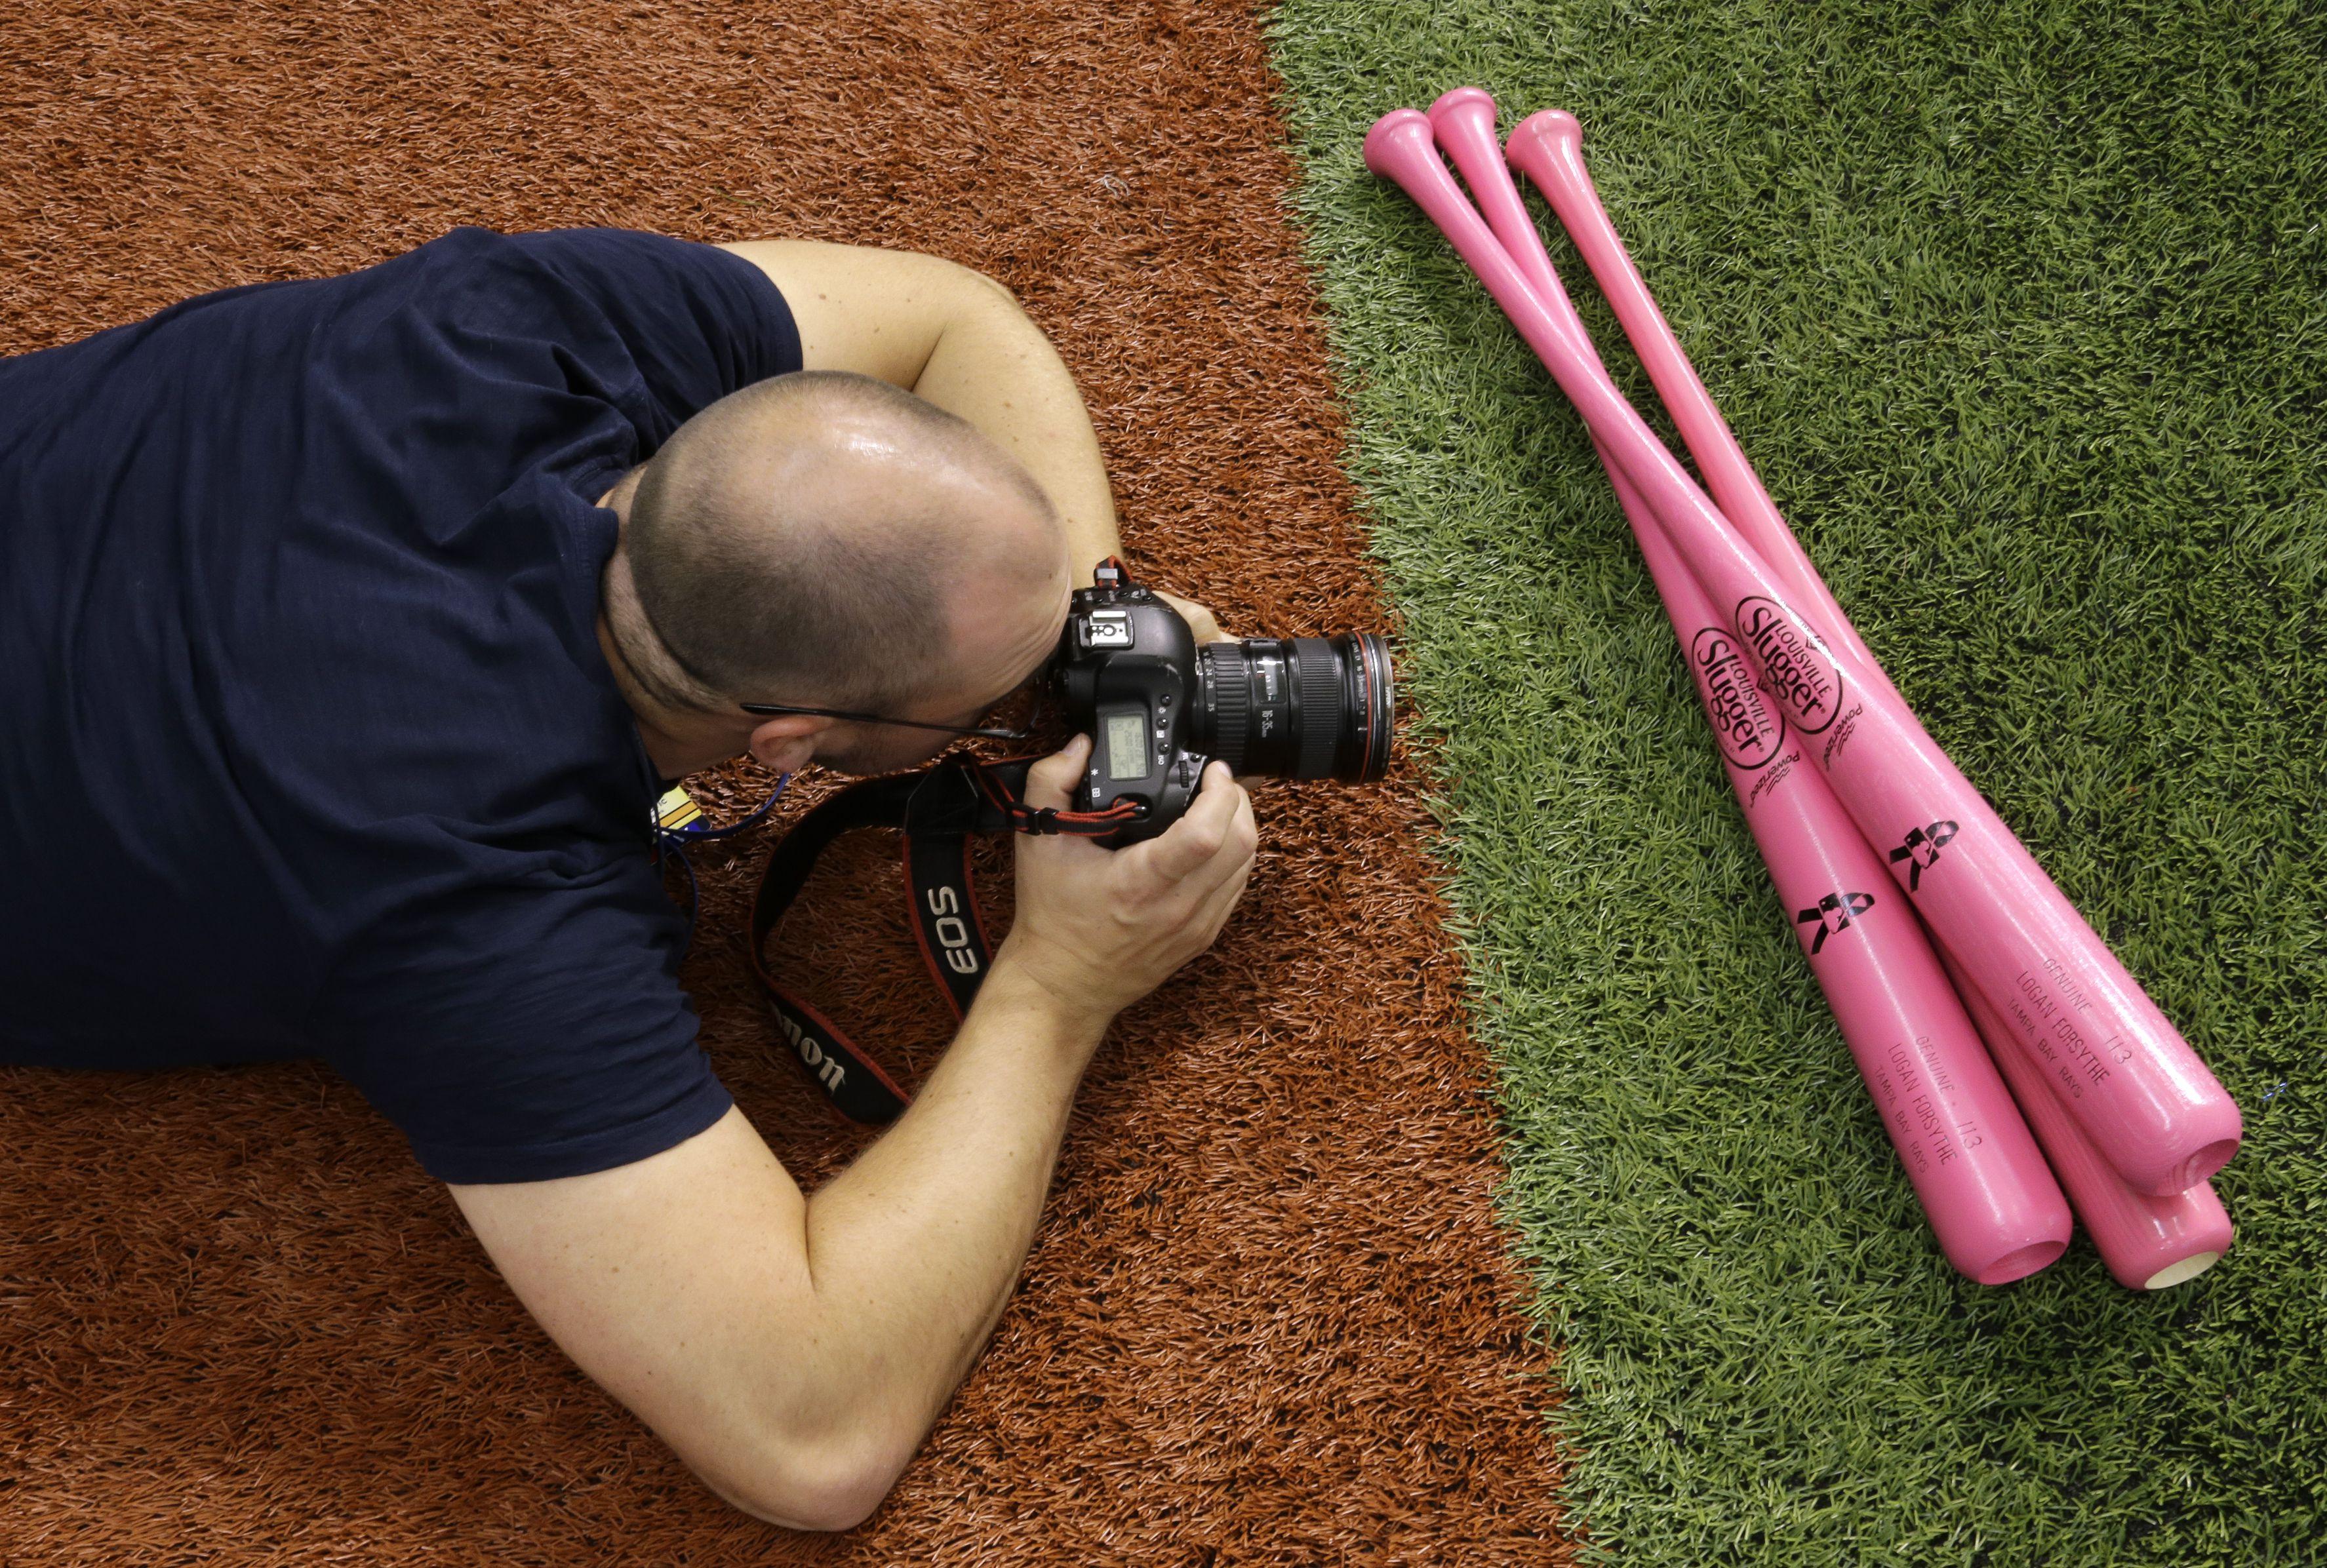 Louisville Slugger bats